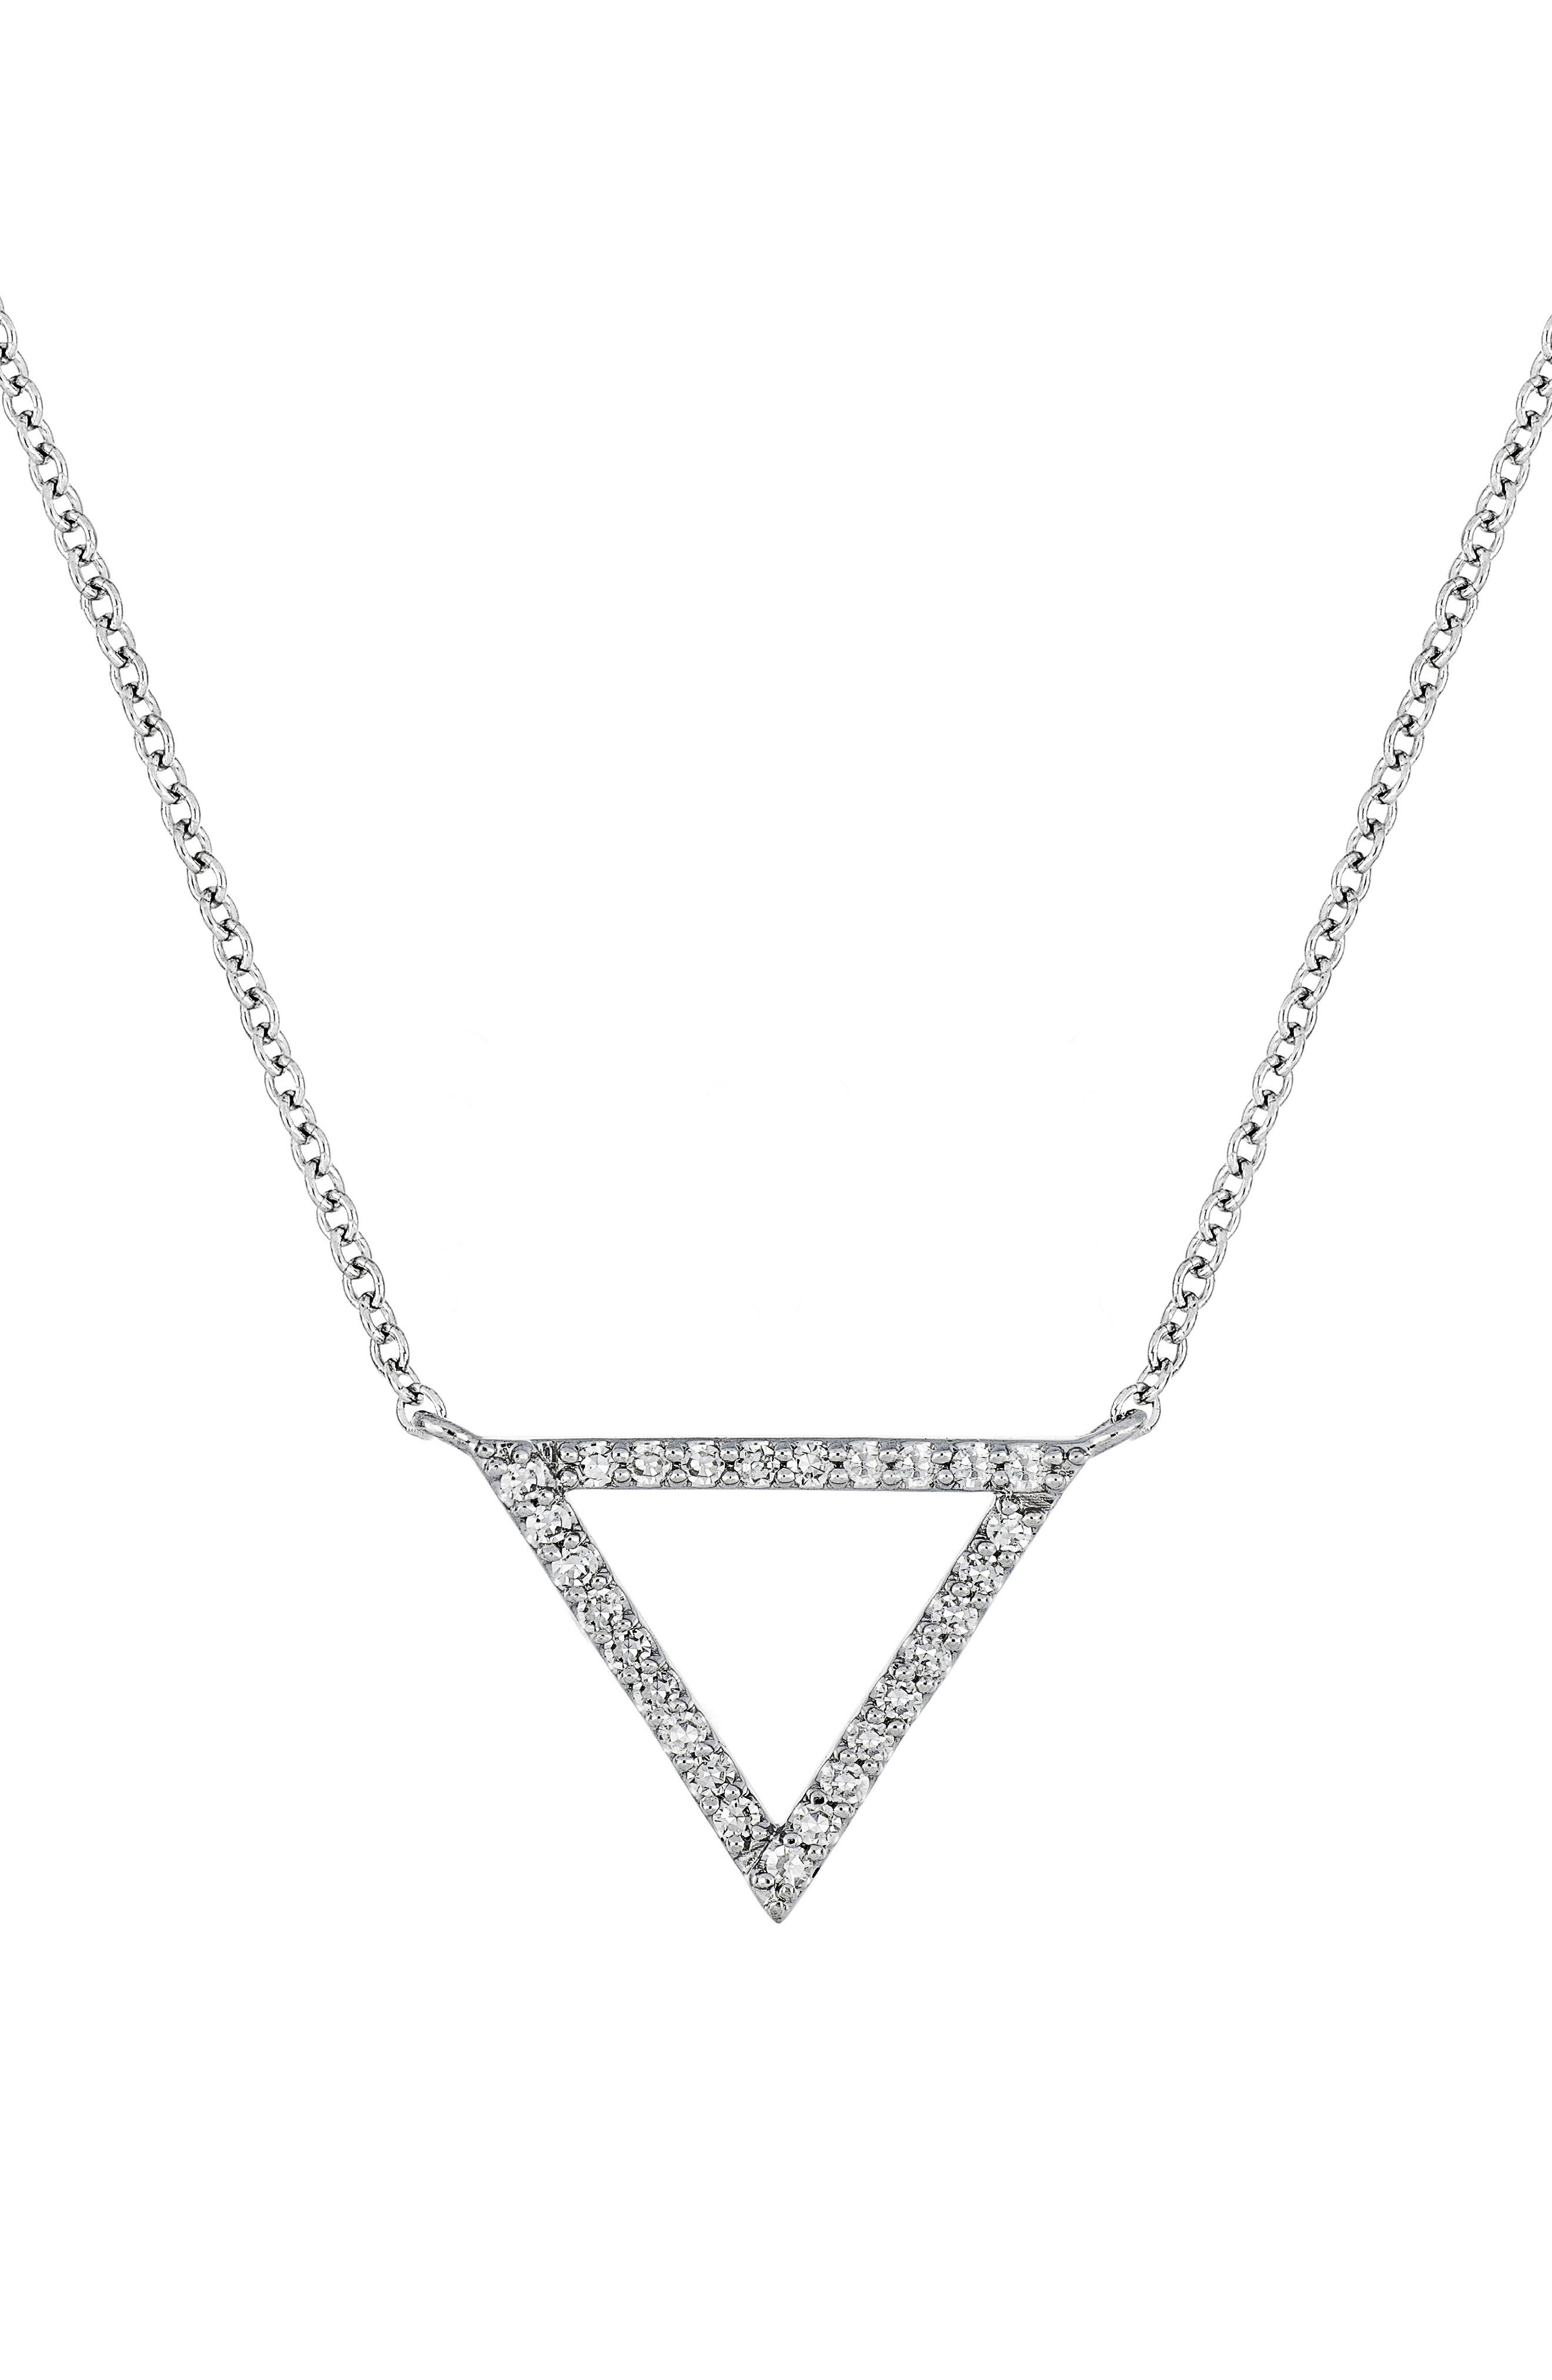 Carrière Medium Triangle Diamond Pendant Necklace,                             Main thumbnail 1, color,                             STERLING SILVER/ DIAMOND